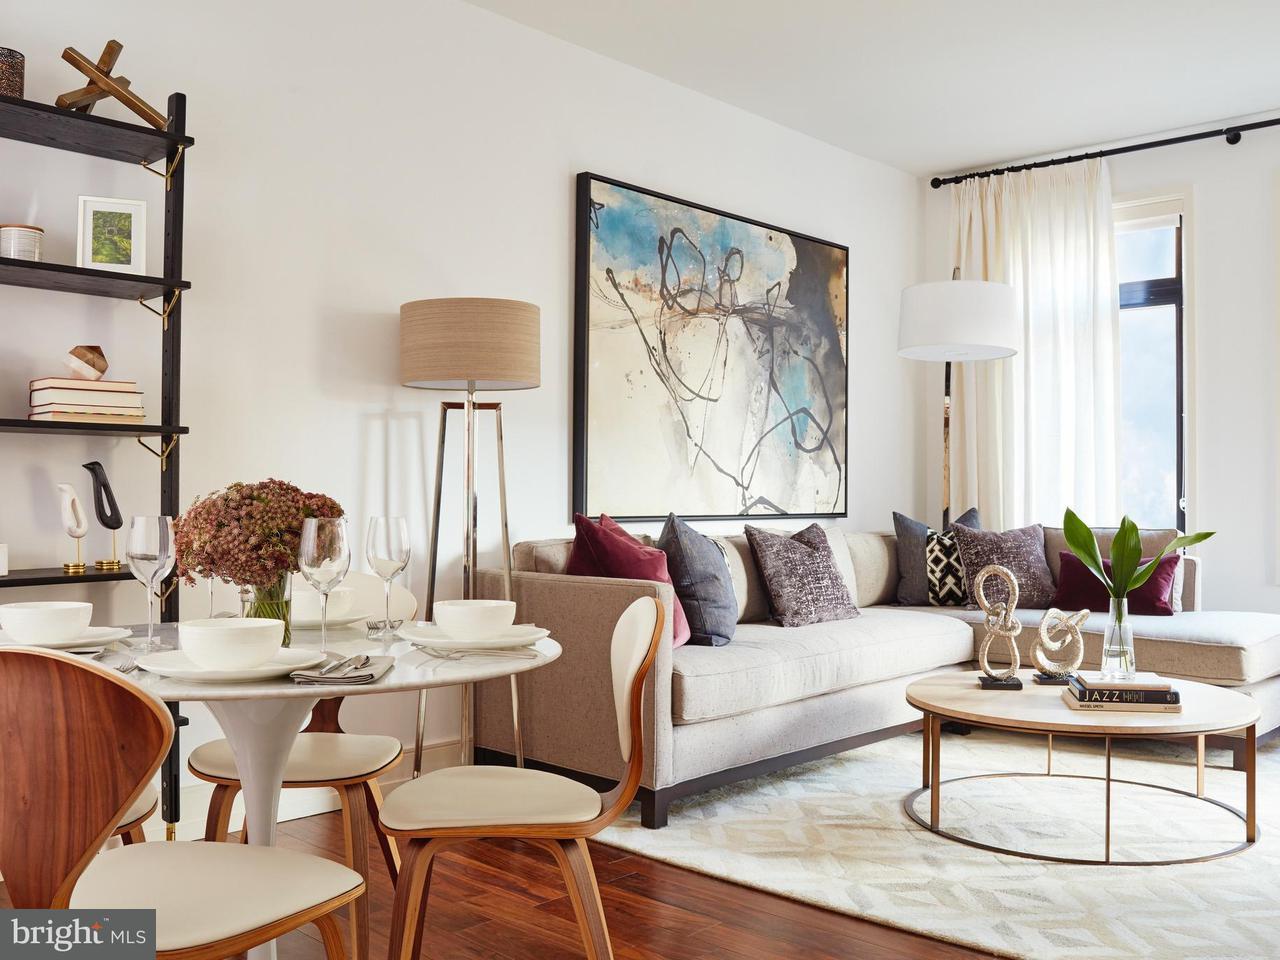 Condominium for Rent at 1310 U St NW #805 Washington, District Of Columbia 20009 United States